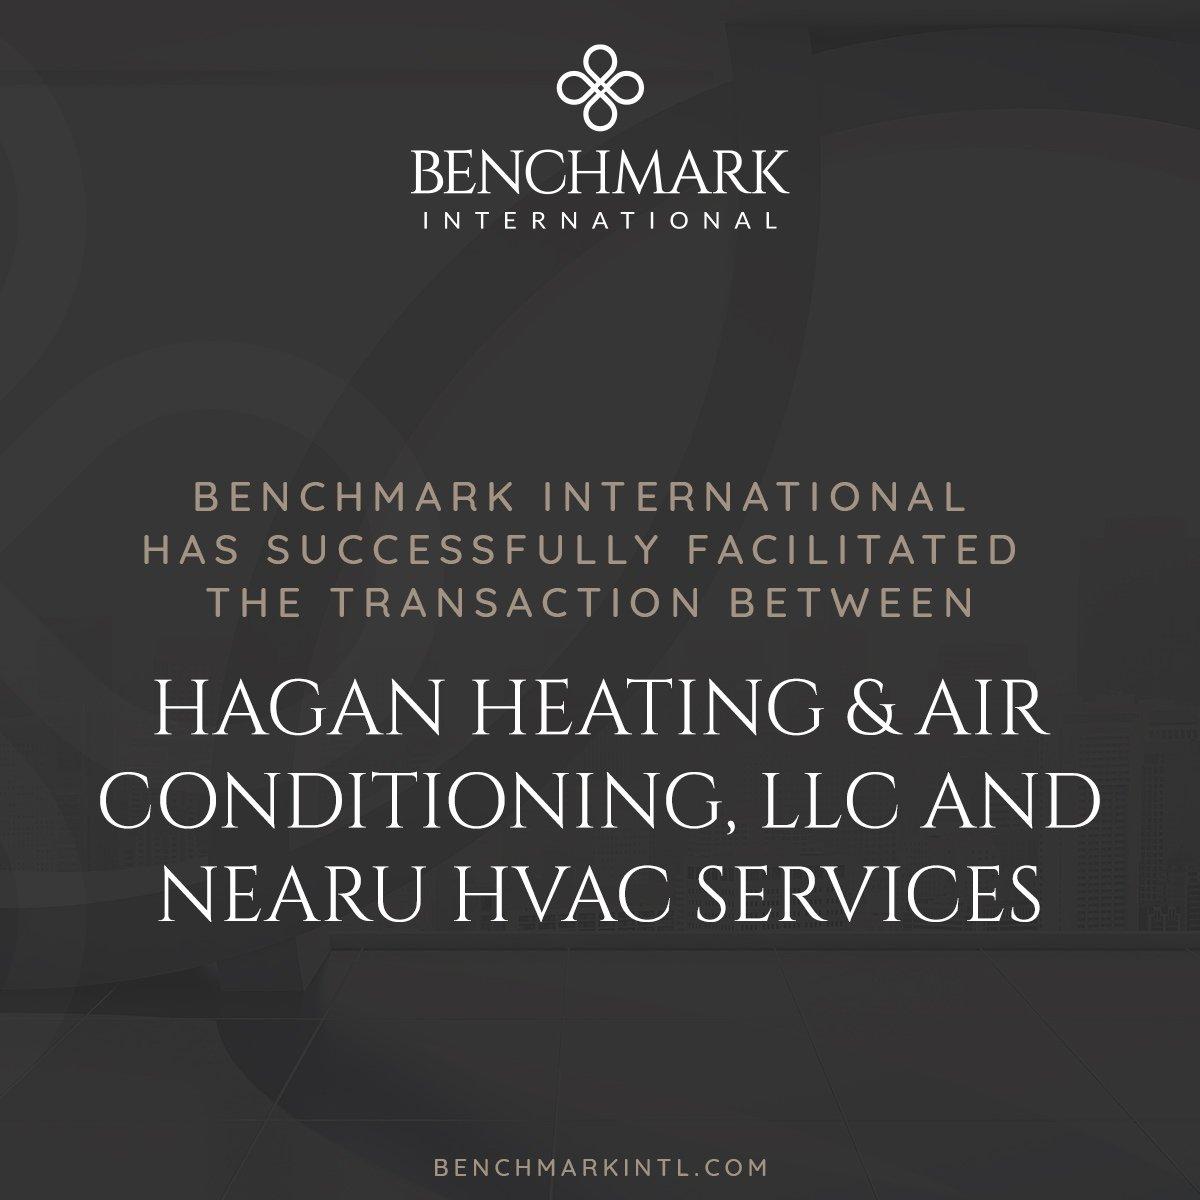 Hagan_Heating_&_Air_Conditioning_LLC_and_Nearu_HVAC_Services_Social